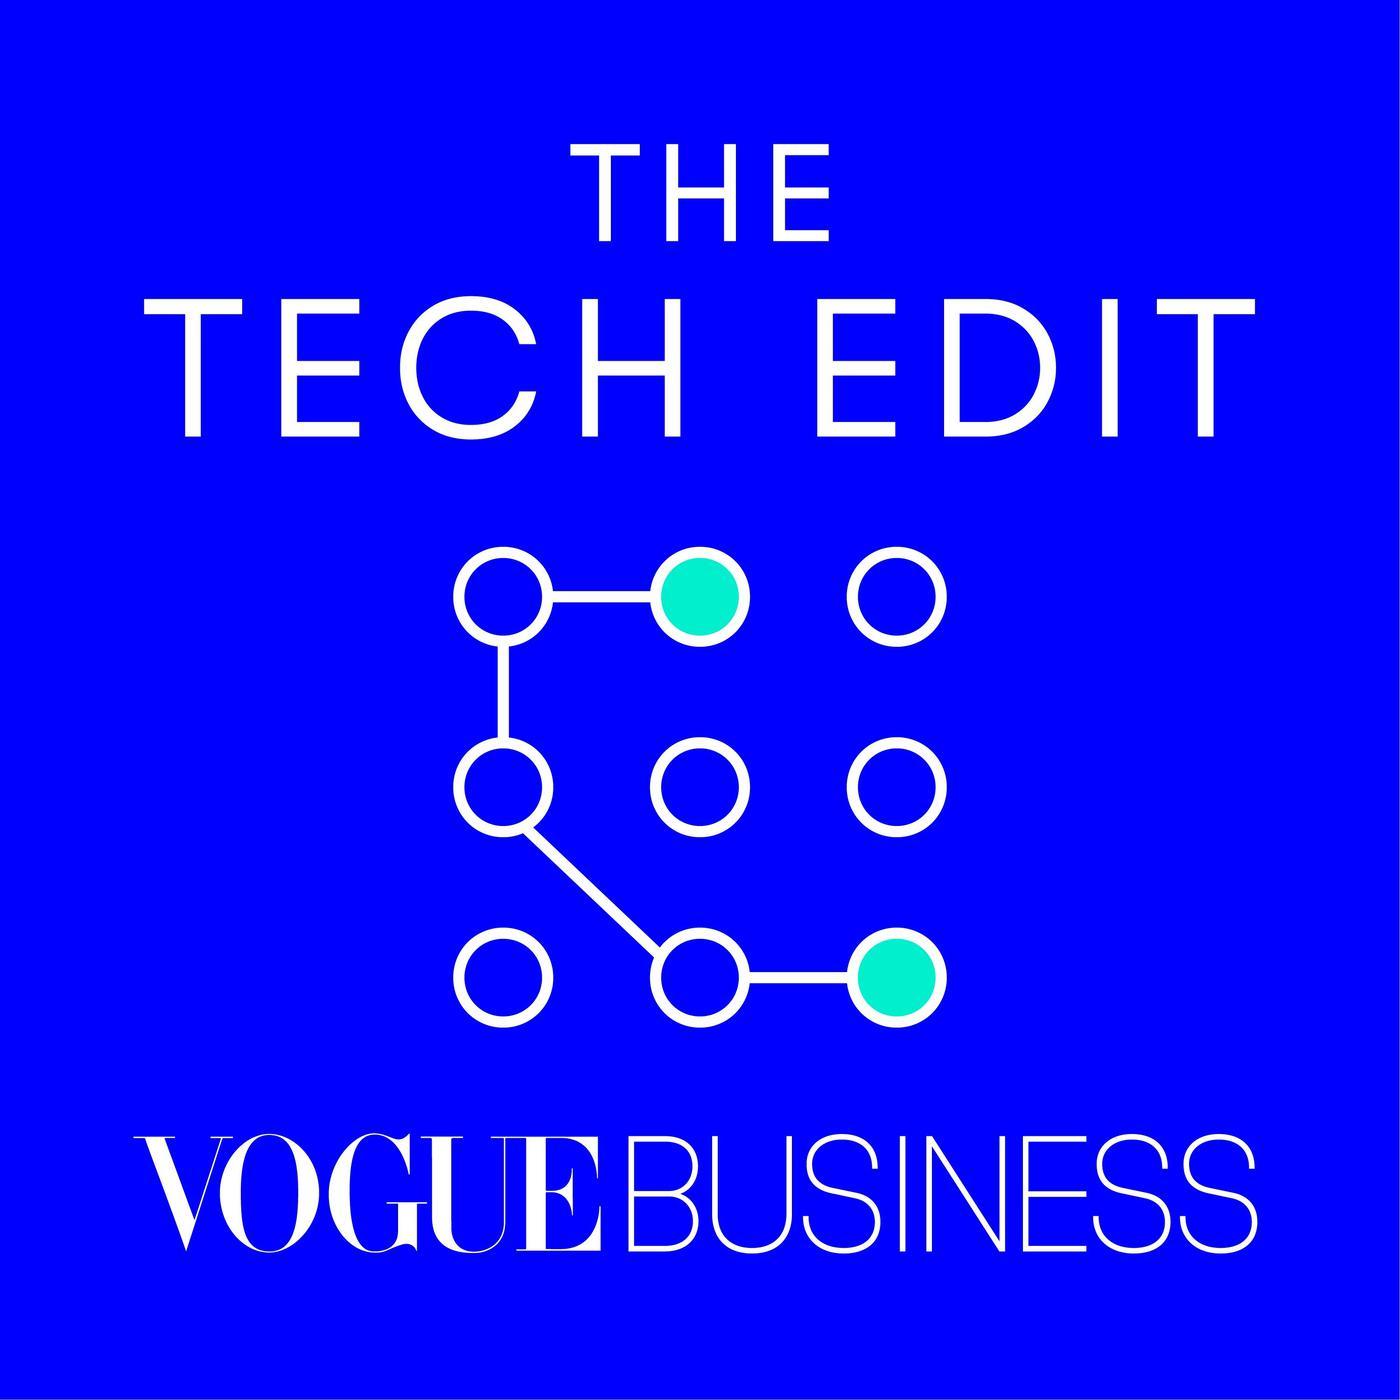 The tech edit, vogue business, logo